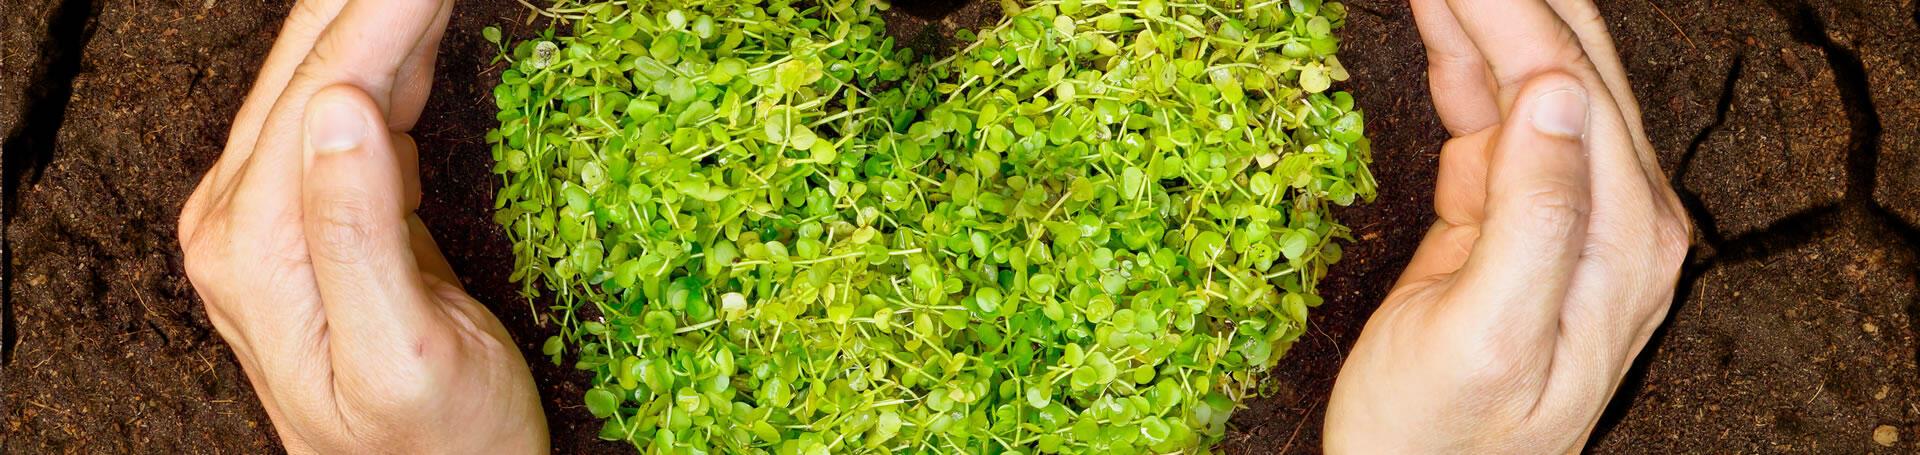 greenvillagecesenatico fr services-green 011